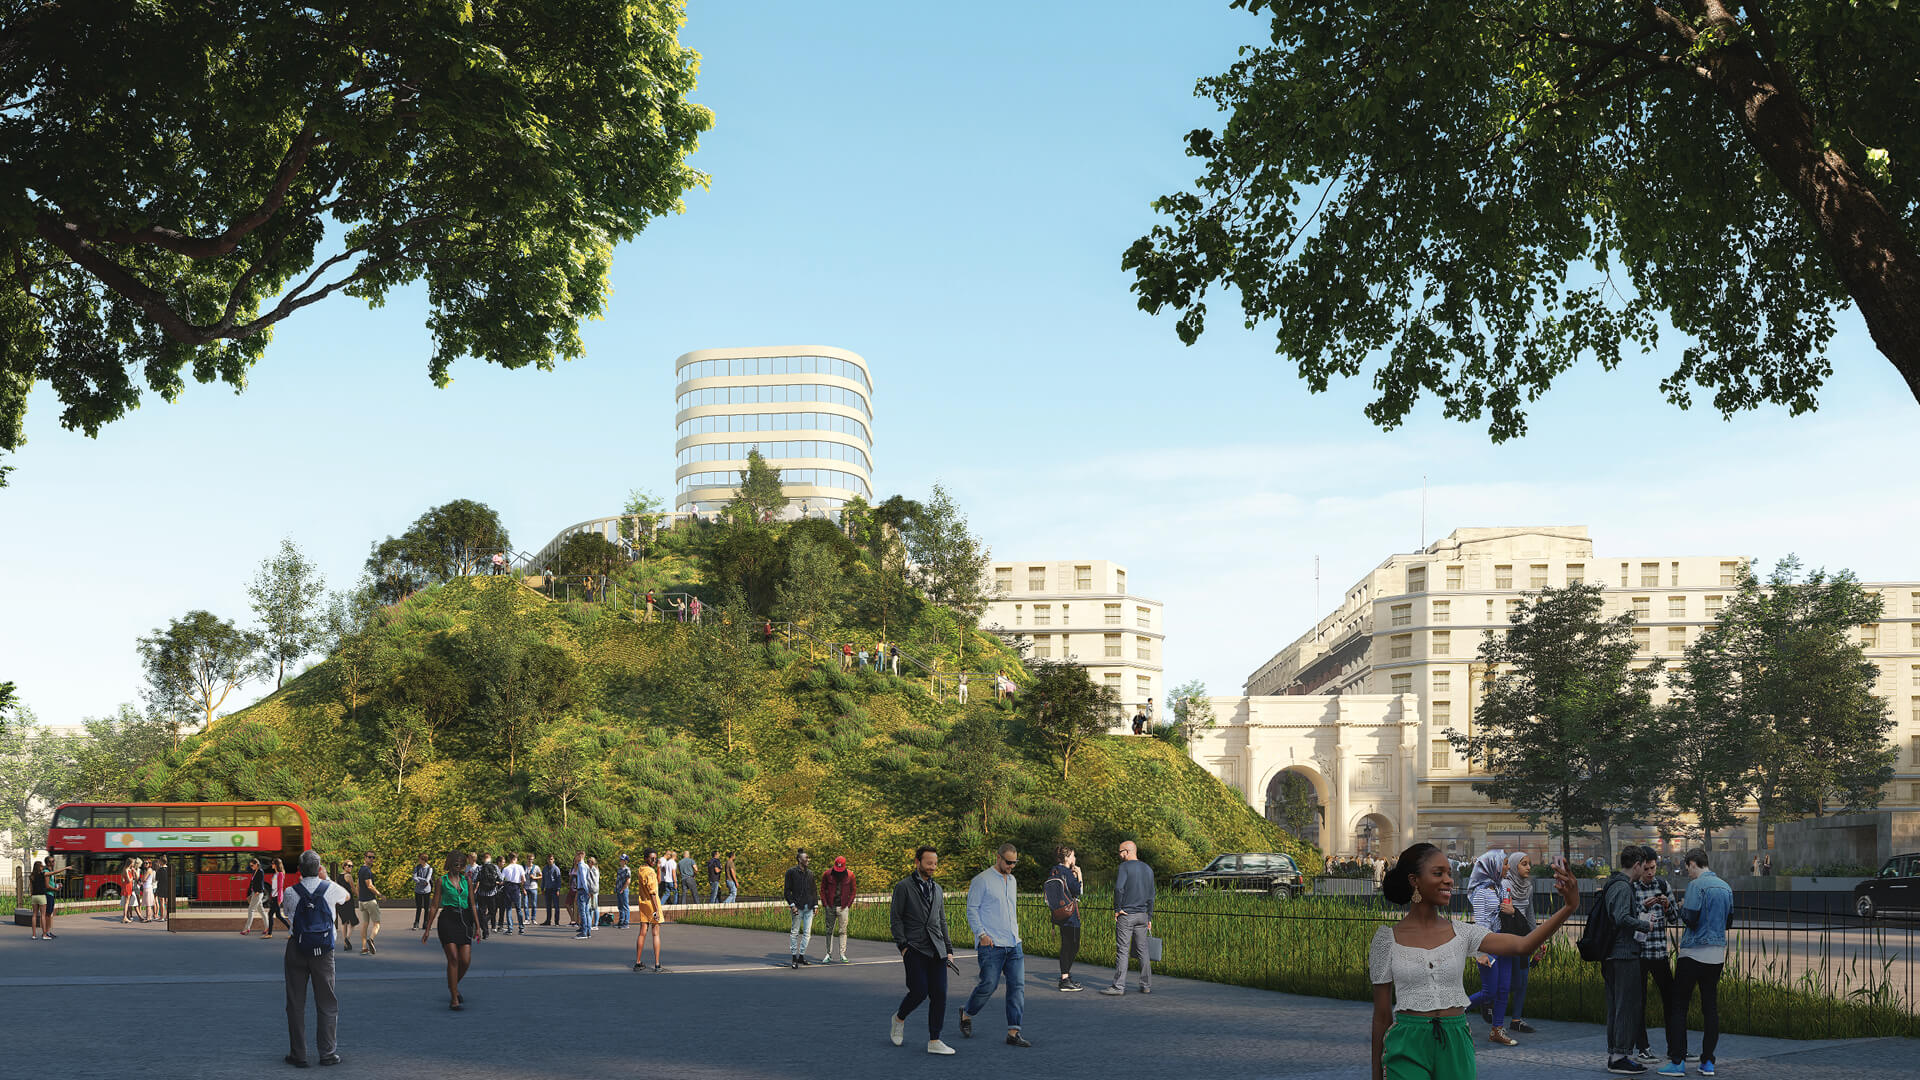 MVRDV designs Marble Arch Hill in London | Marble Arch Hill designed by MVRDV| STIRworld